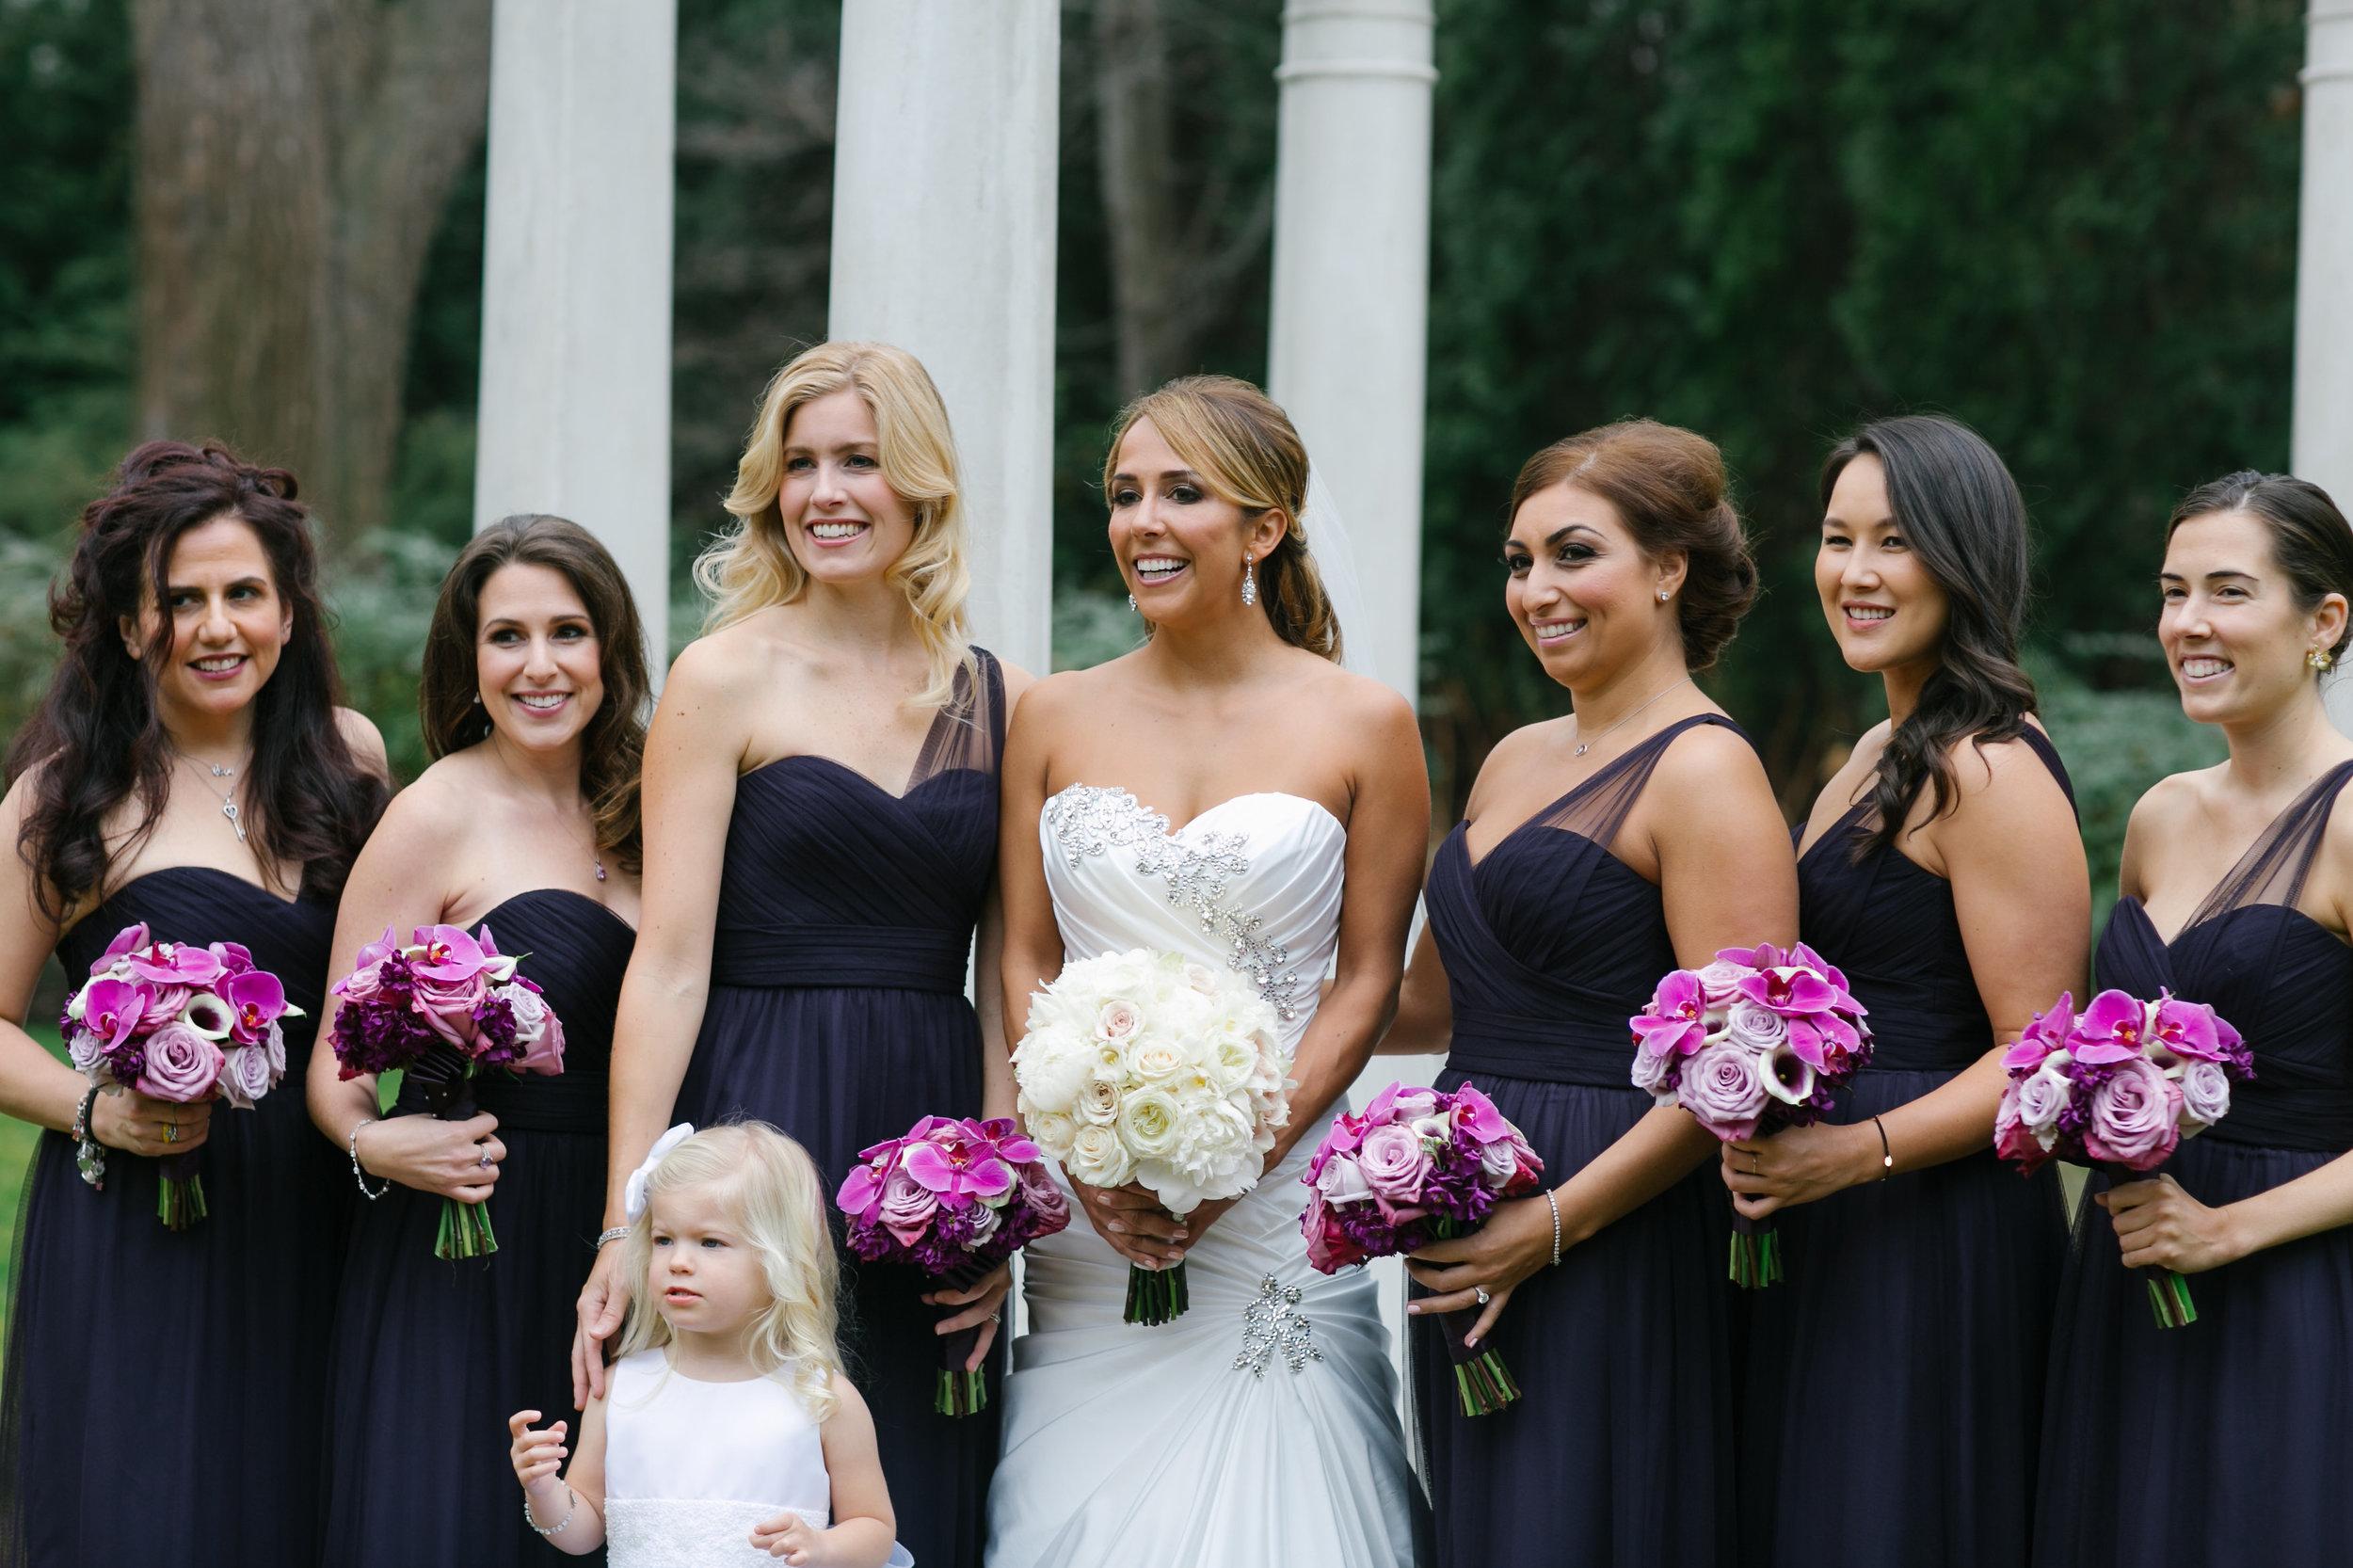 Ceci_New_York_Custom_Invitation_ New_Jersey_Wedding_Luxury_Personalized_Ceci_Style_Bride_Foil_Stamping20.jpg